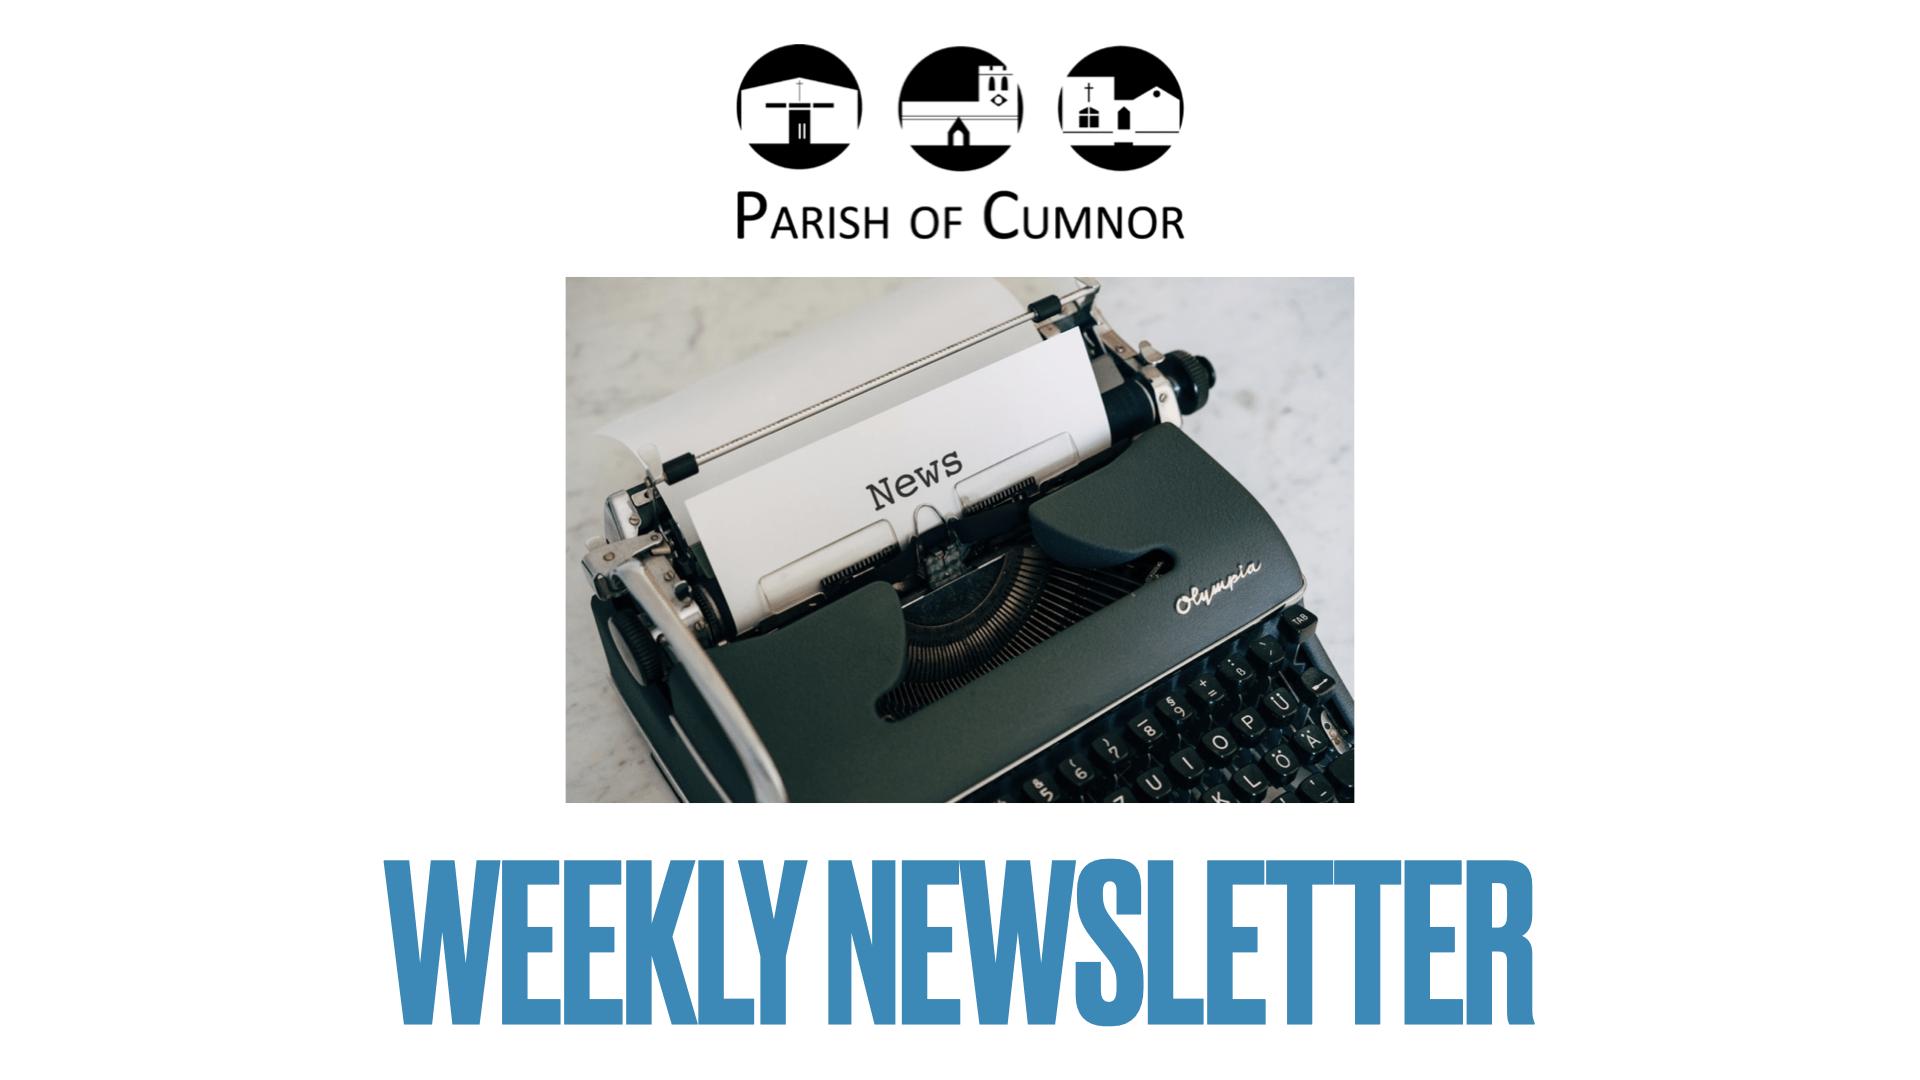 Newsletter for April 25th 2021